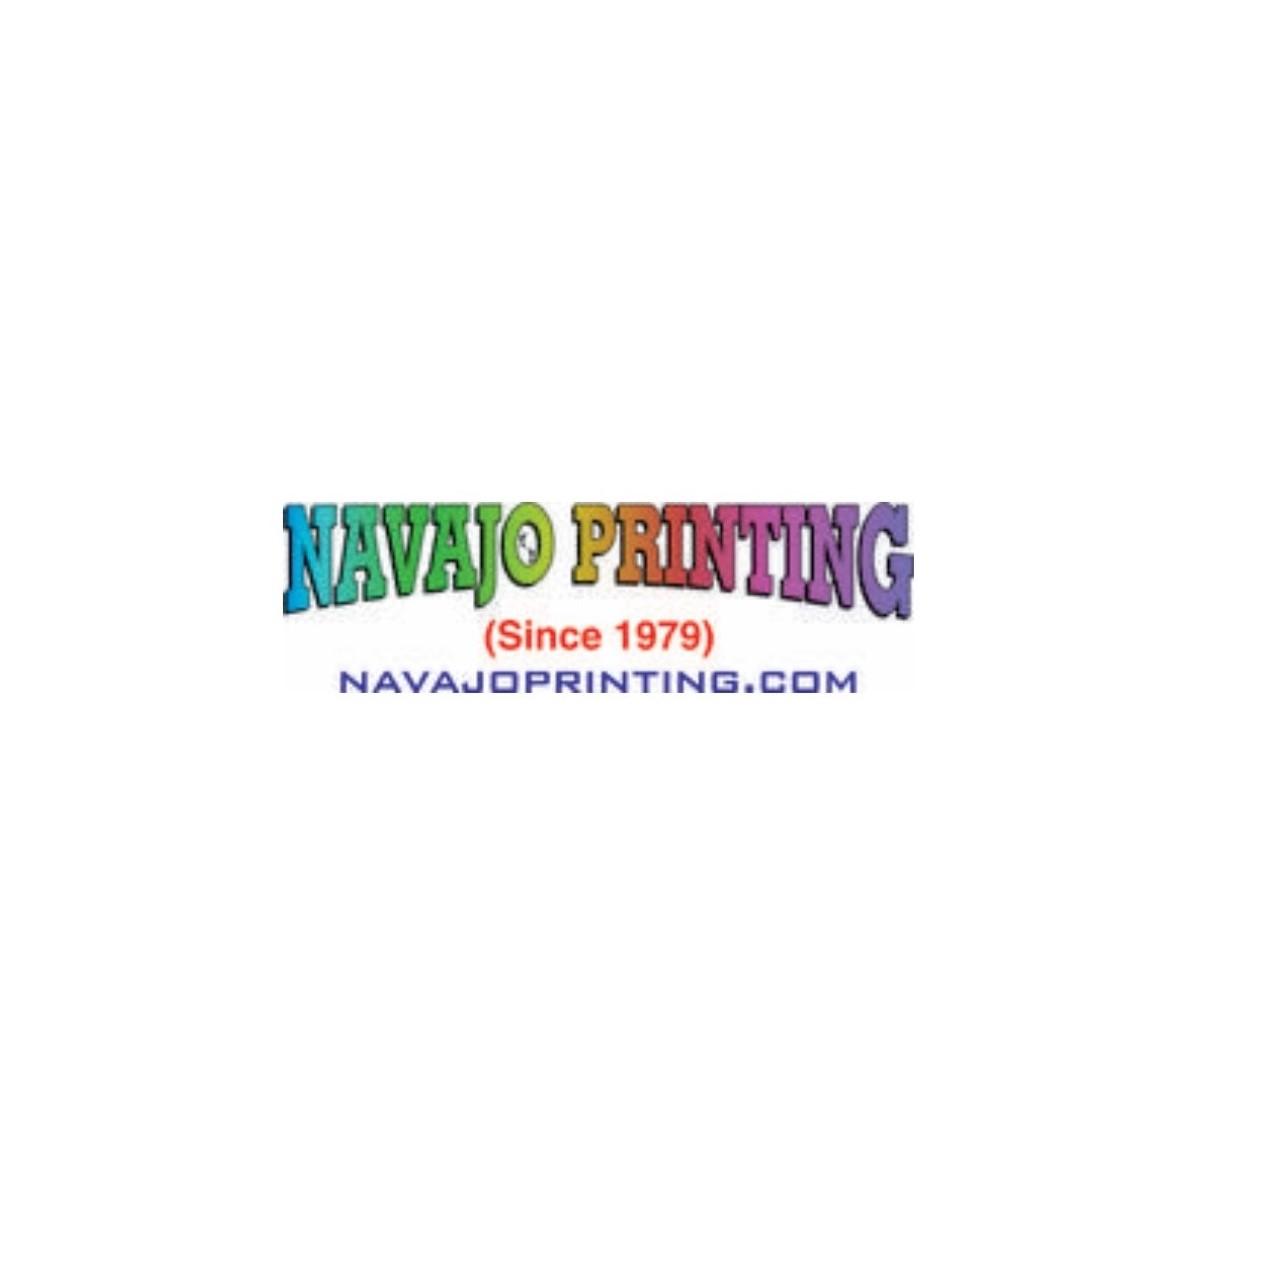 Navajo Printing